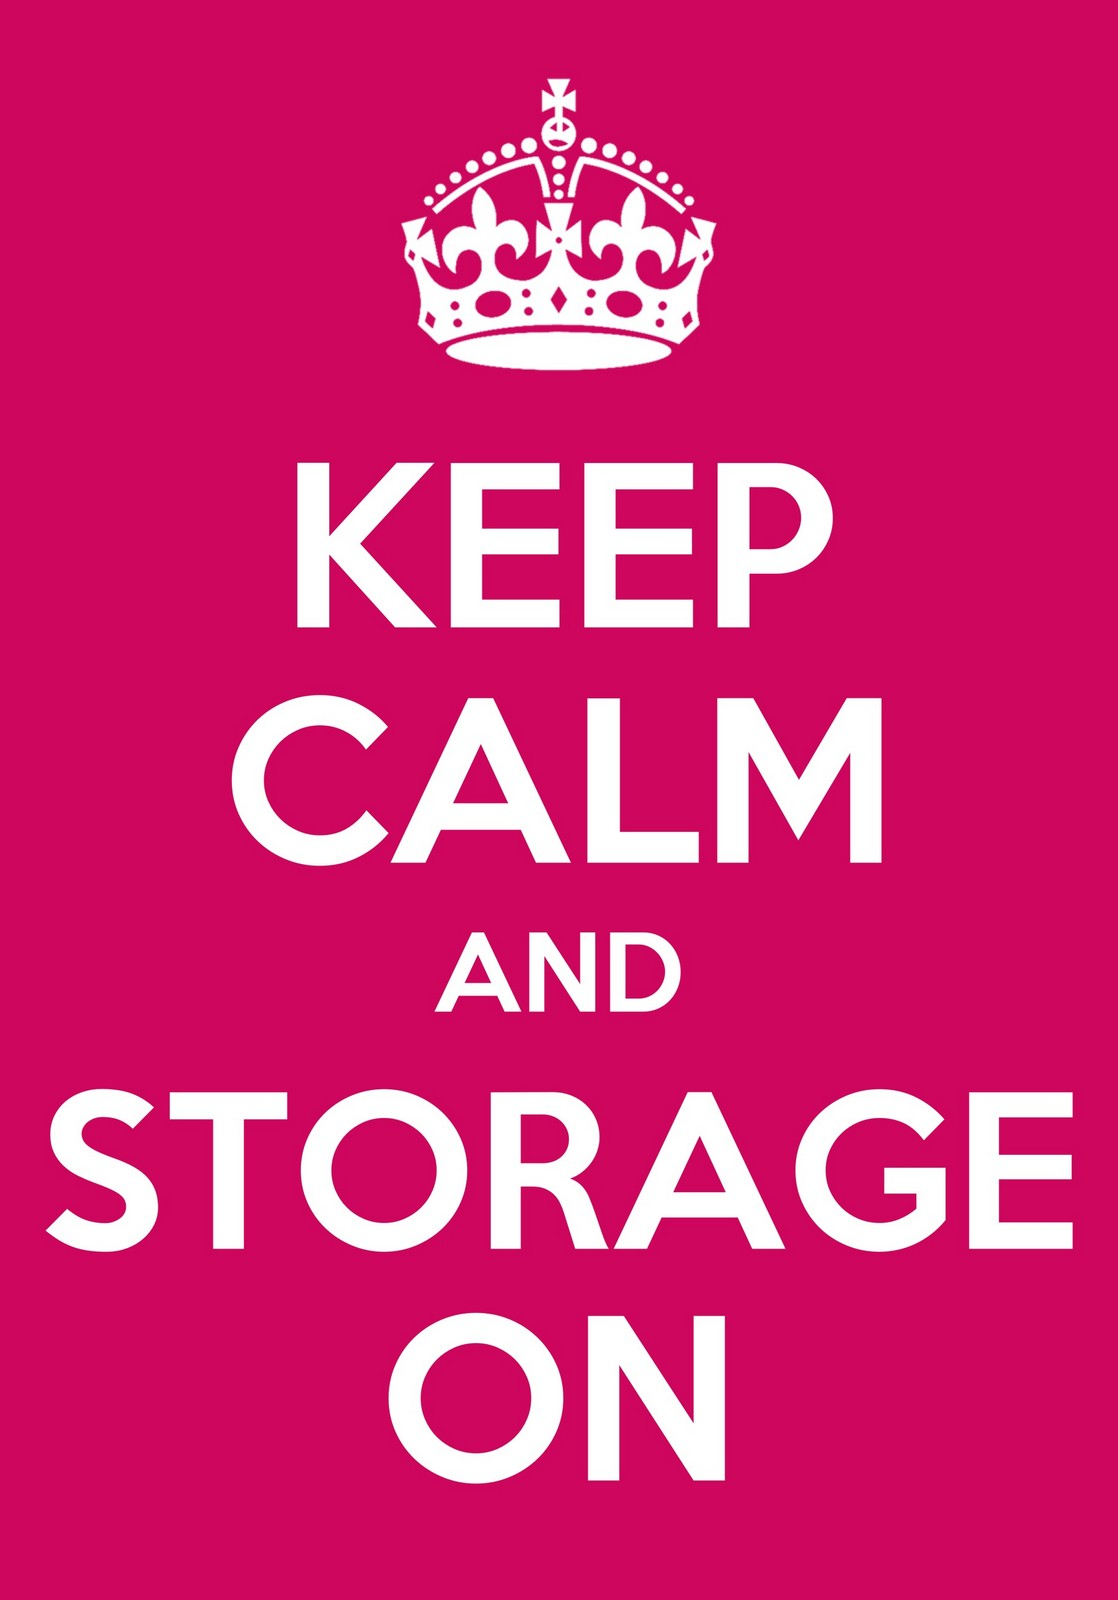 keep calm and storage on